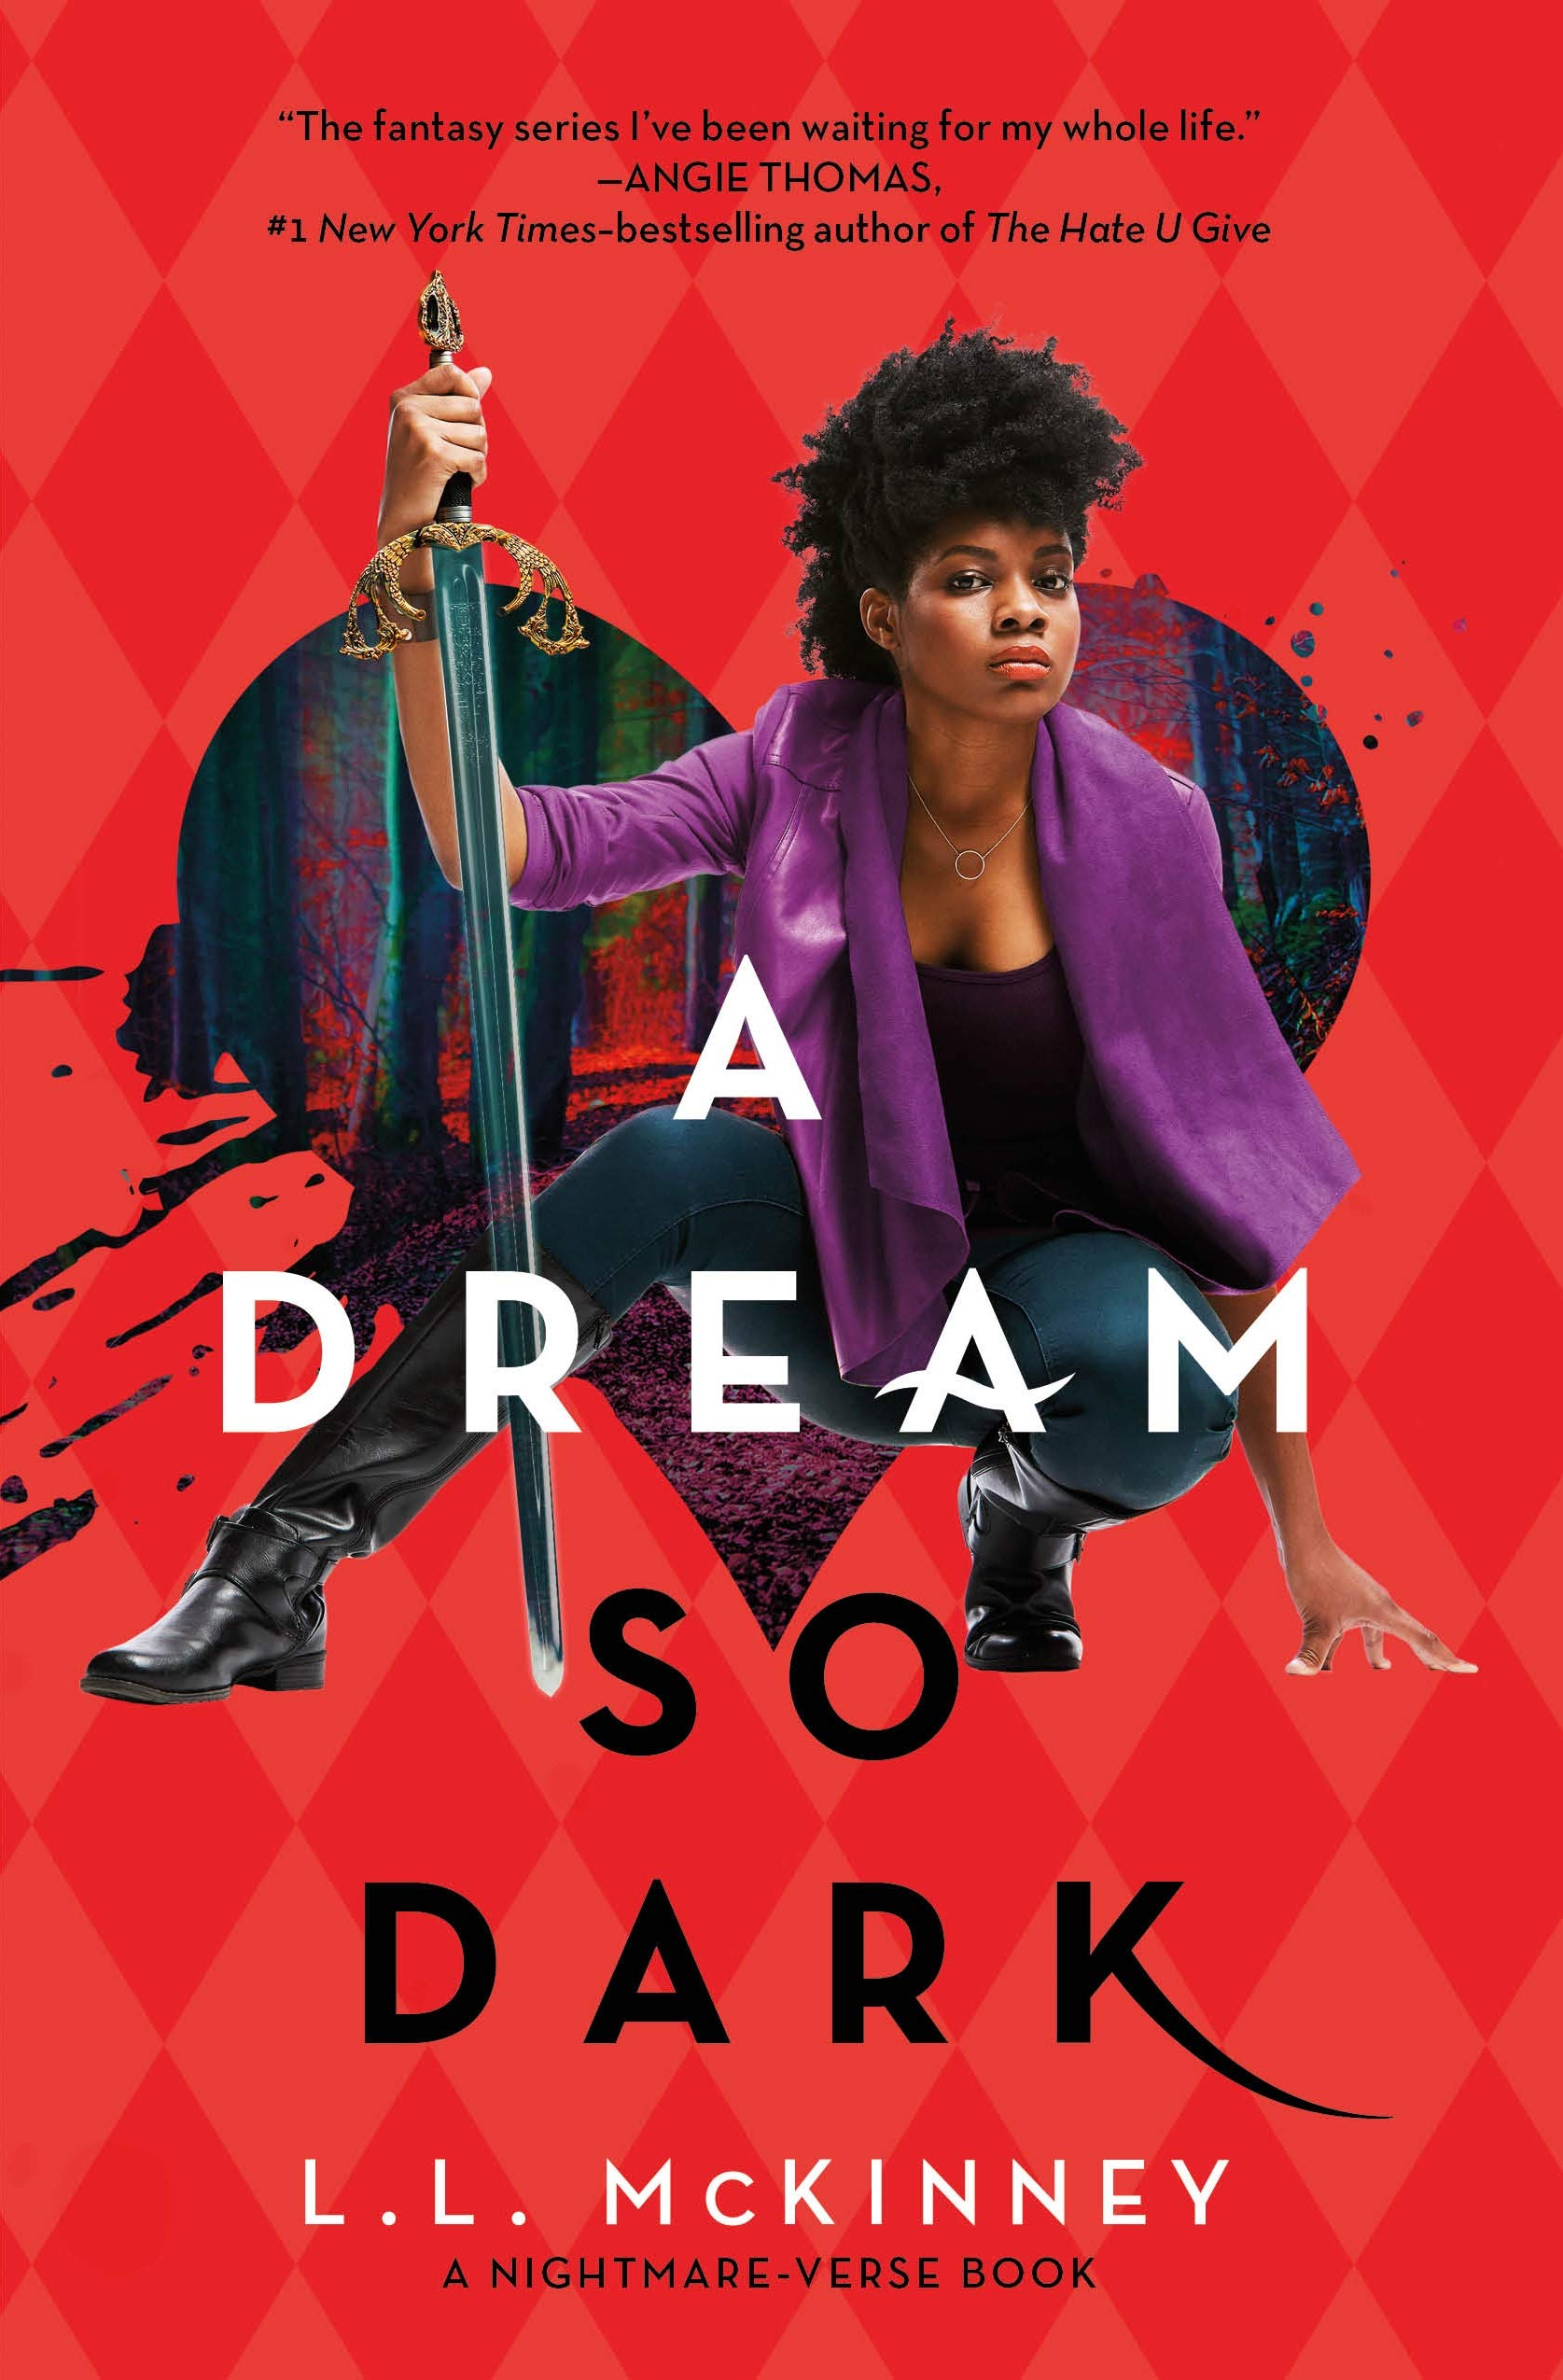 Amazon.com: A Dream So Dark (The Nightmare-Verse) (9781250153920 ...